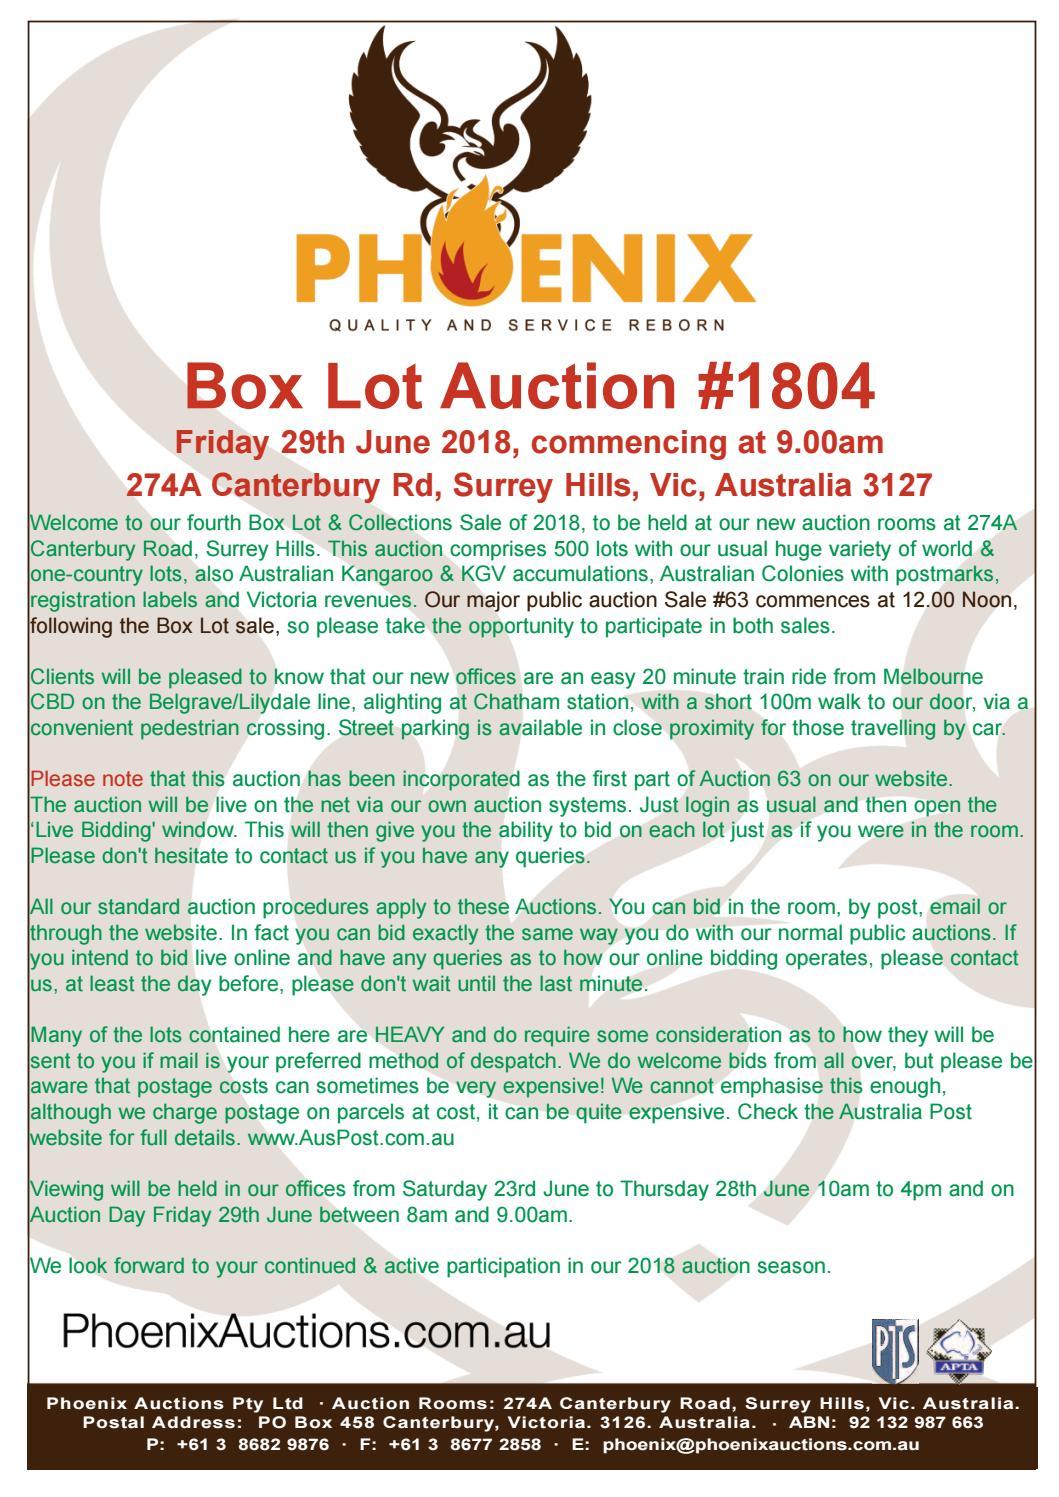 Boxlot Auction 1804 by Phoenix Auctions Pty Ltd - issuu